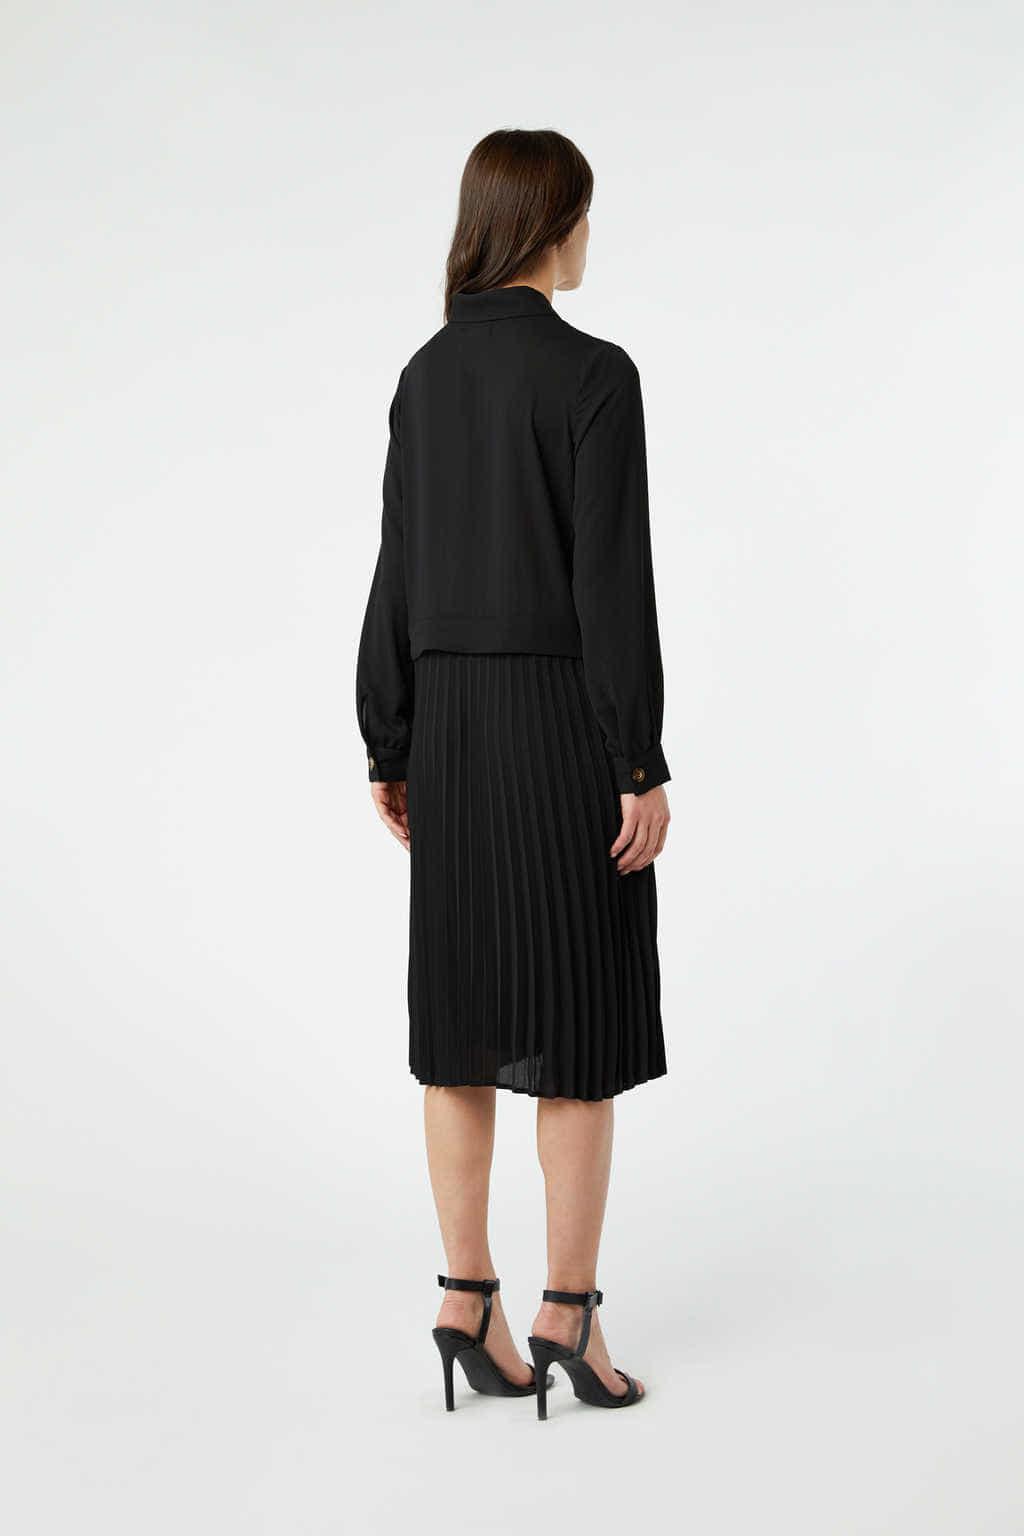 Dress 3393 Black 13